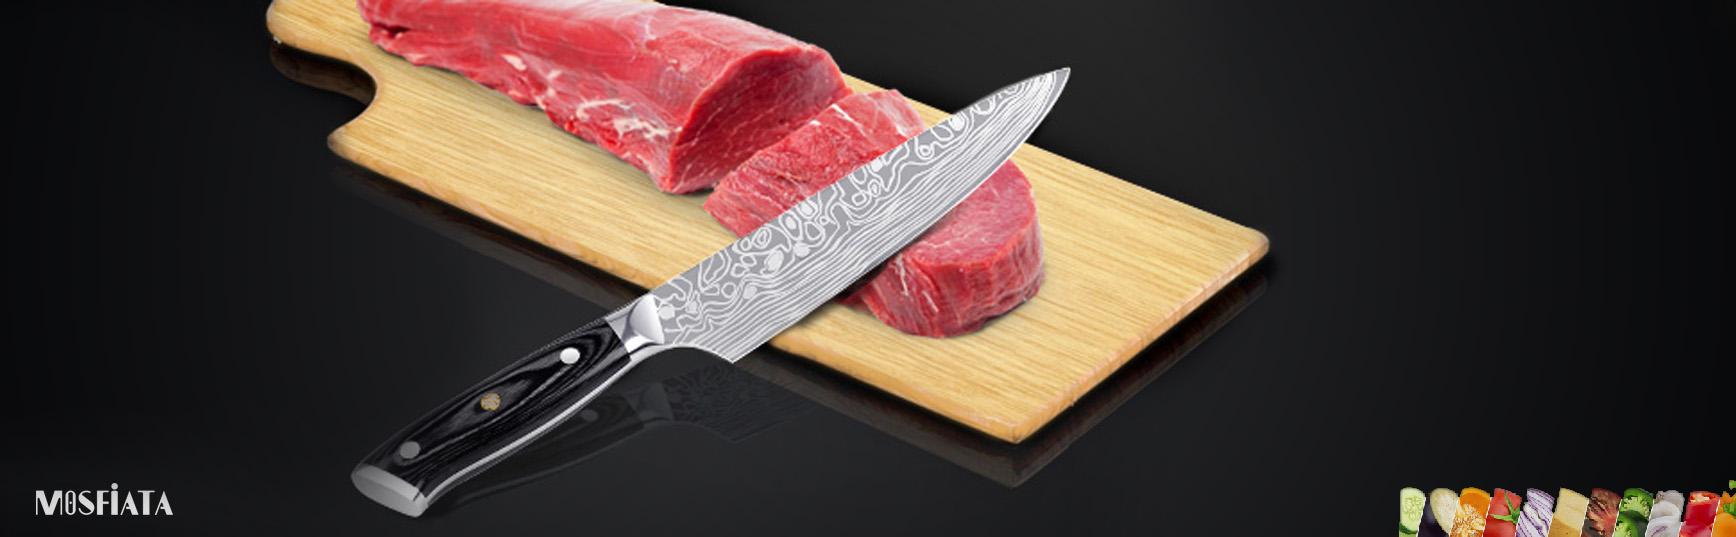 mosfiata knife 09 NEW edit.jpg